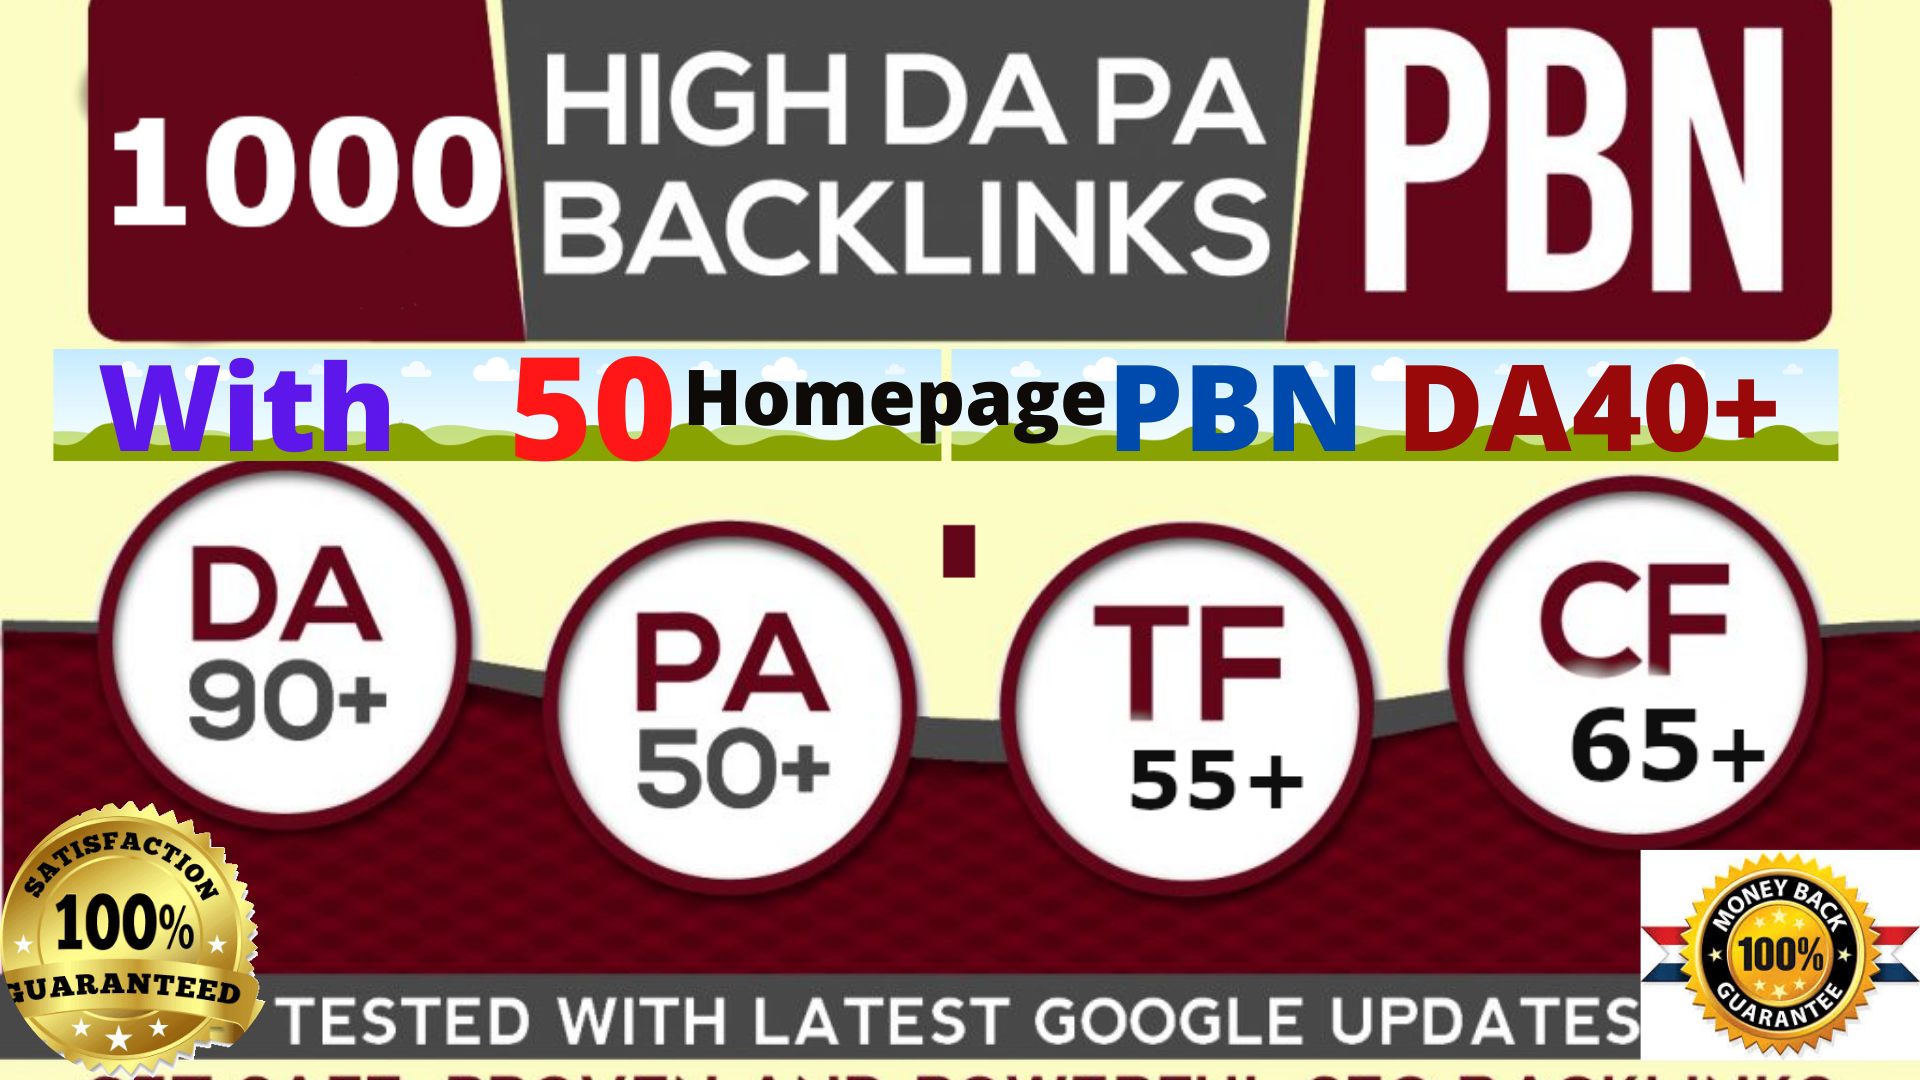 2 buy 1 Free high DA90+1000+ With 50 Homepage PBNs DA40+ Backlinks